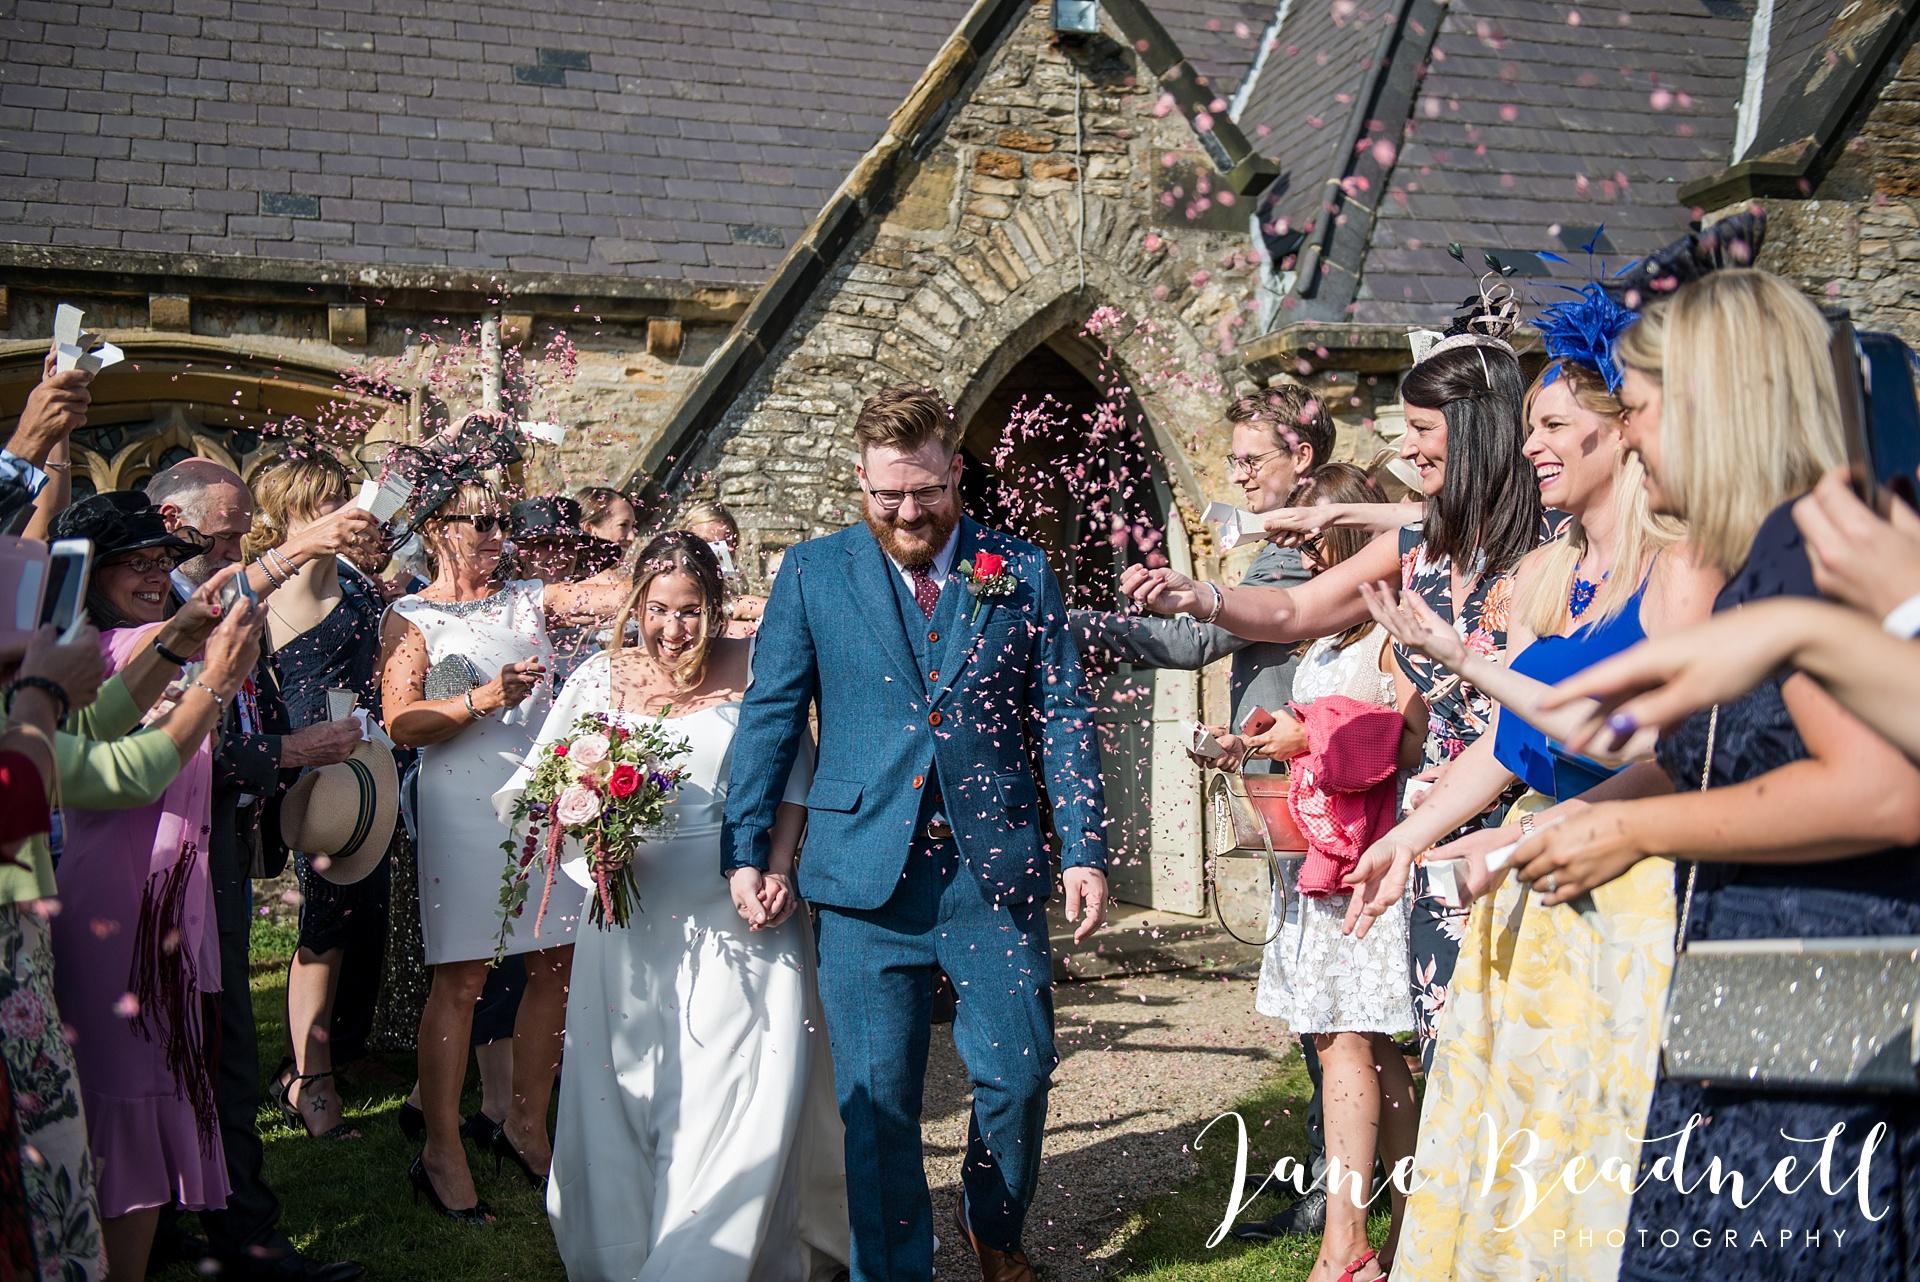 fine-art-wedding-photographer-jane-beadnell-yorkshire-wedding-photographer_0060